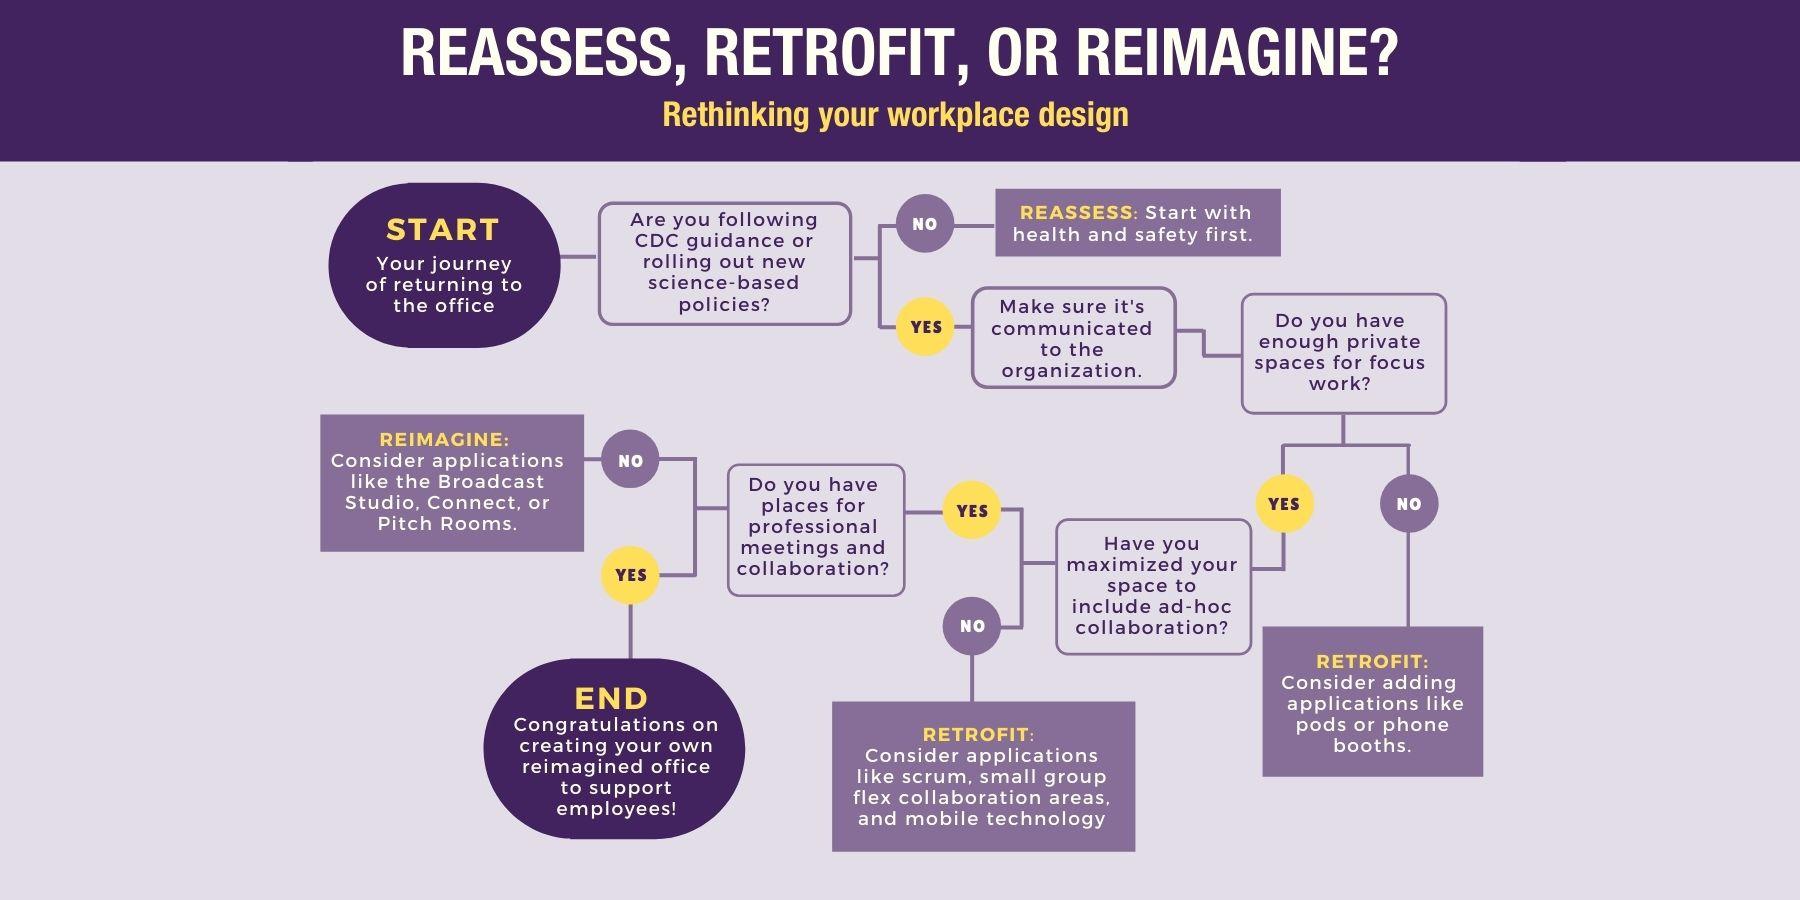 Reassess, retrofit, reimagine flowchart